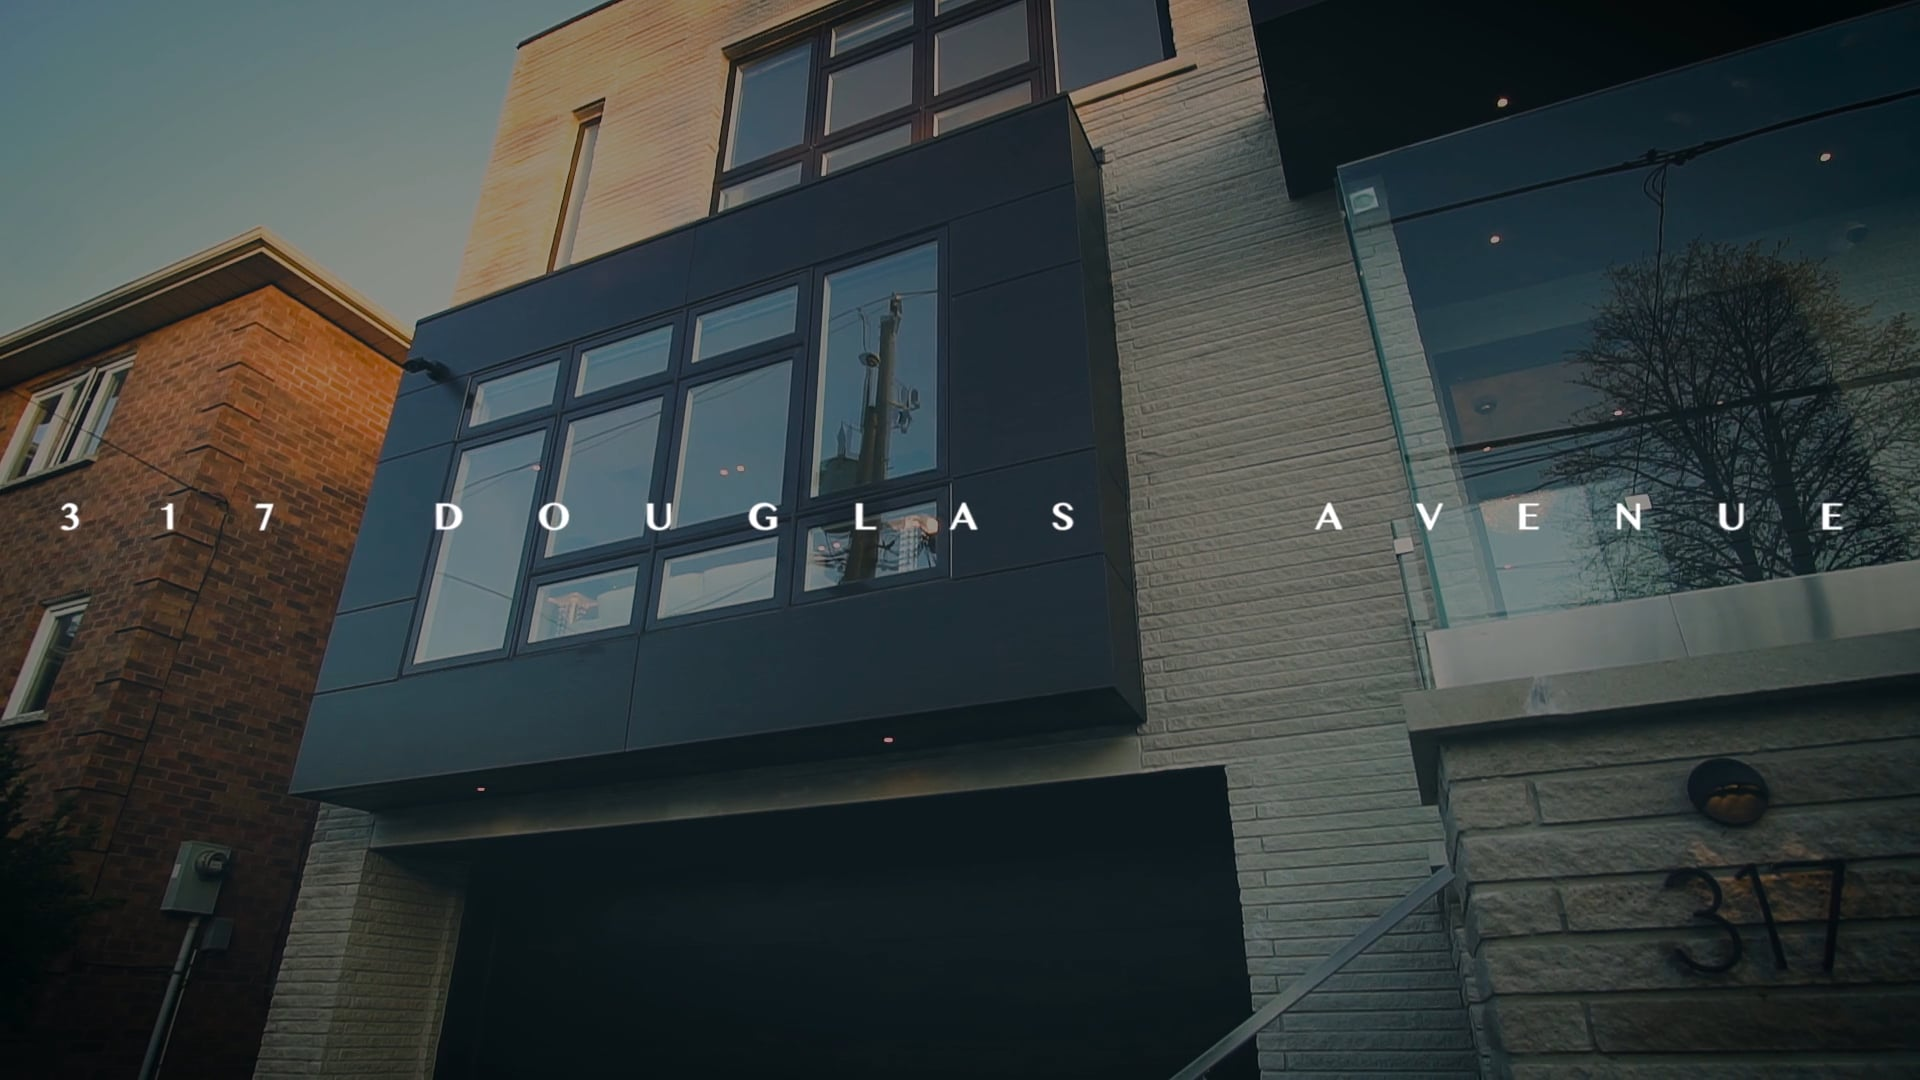 317 Douglas Ave